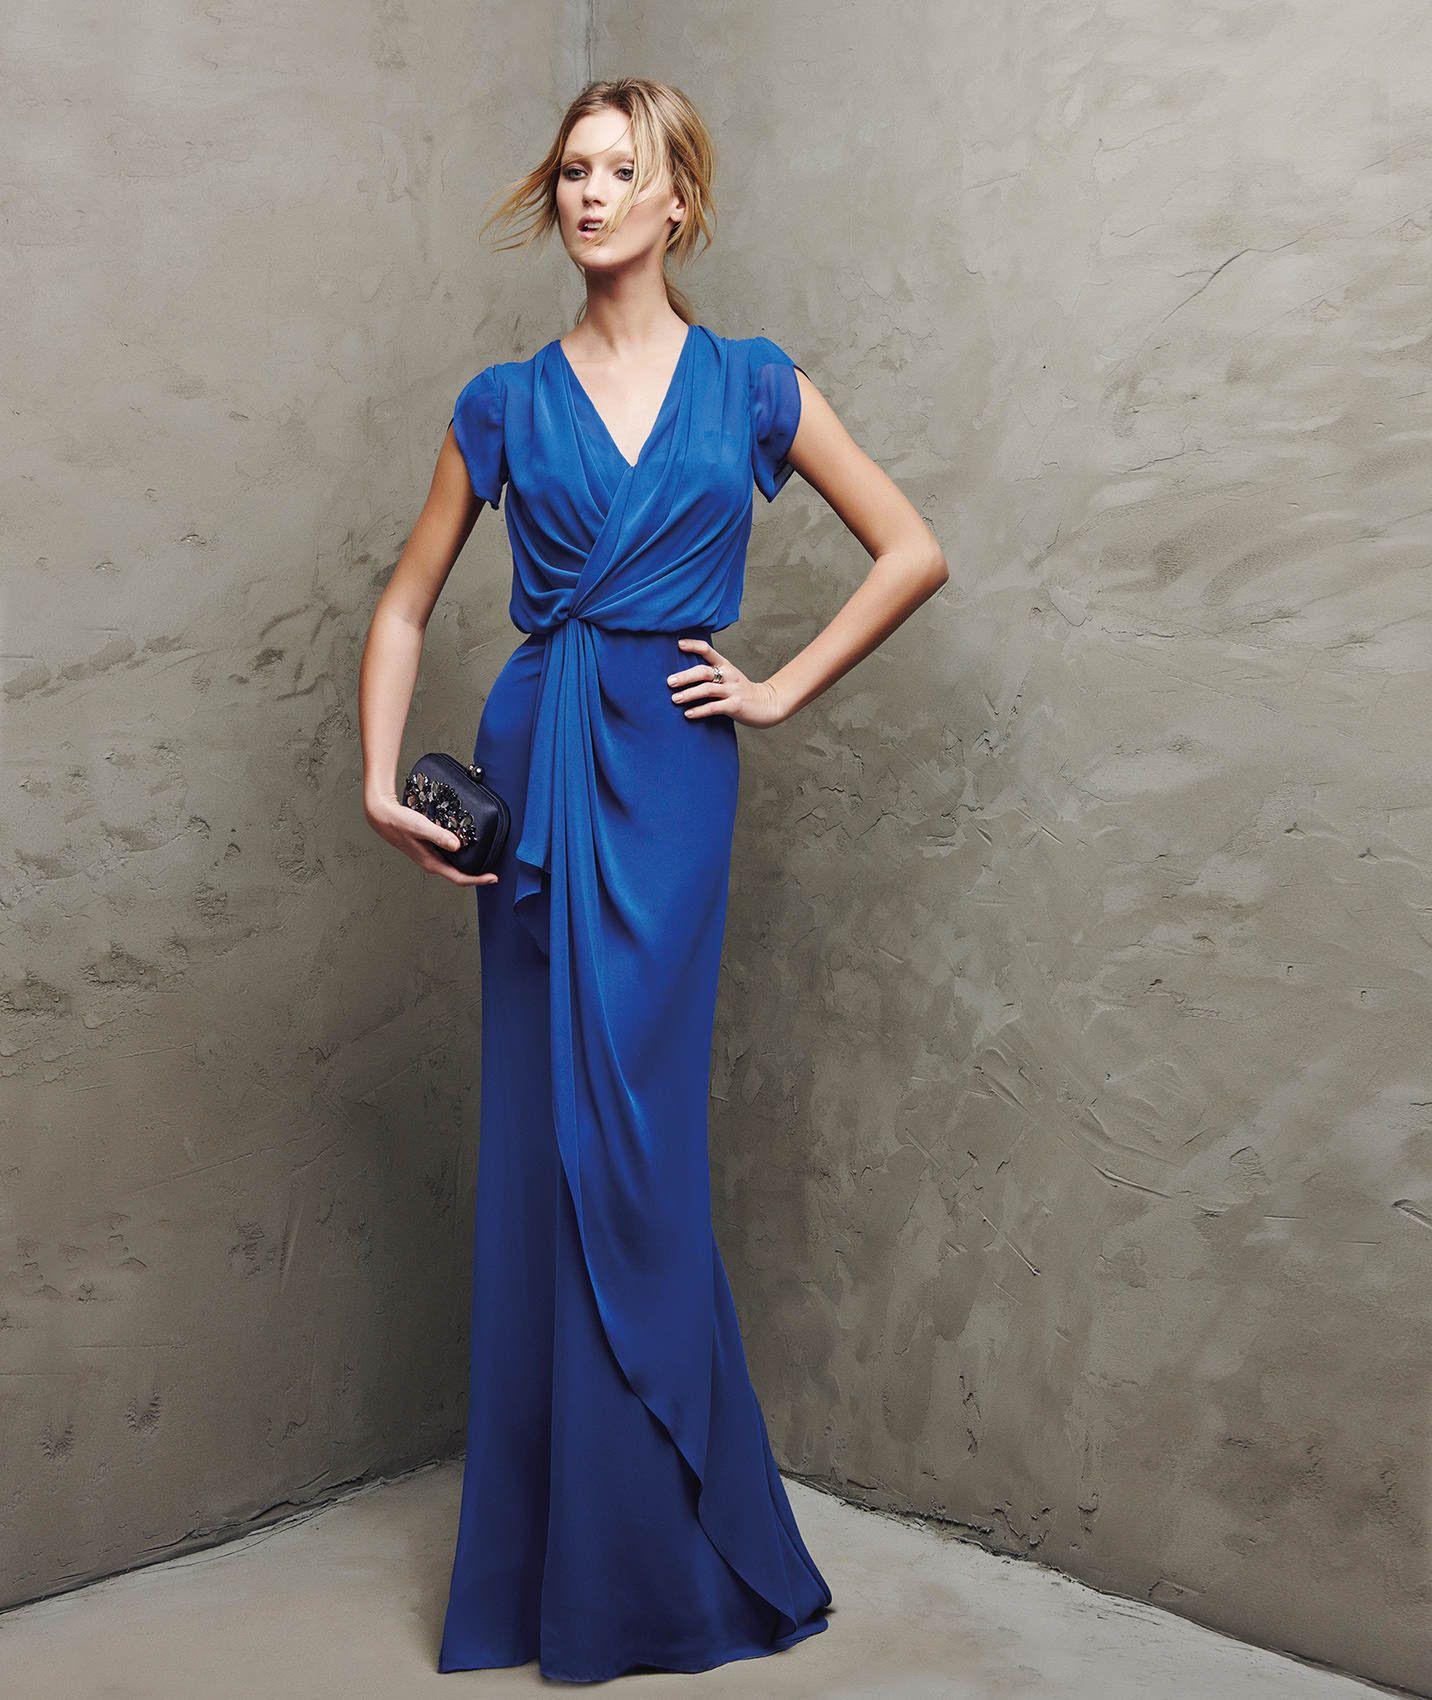 Long dresses for wedding party  Vestido de gasa de fiesta  CHIC  Pinterest  Gowns Clothes and